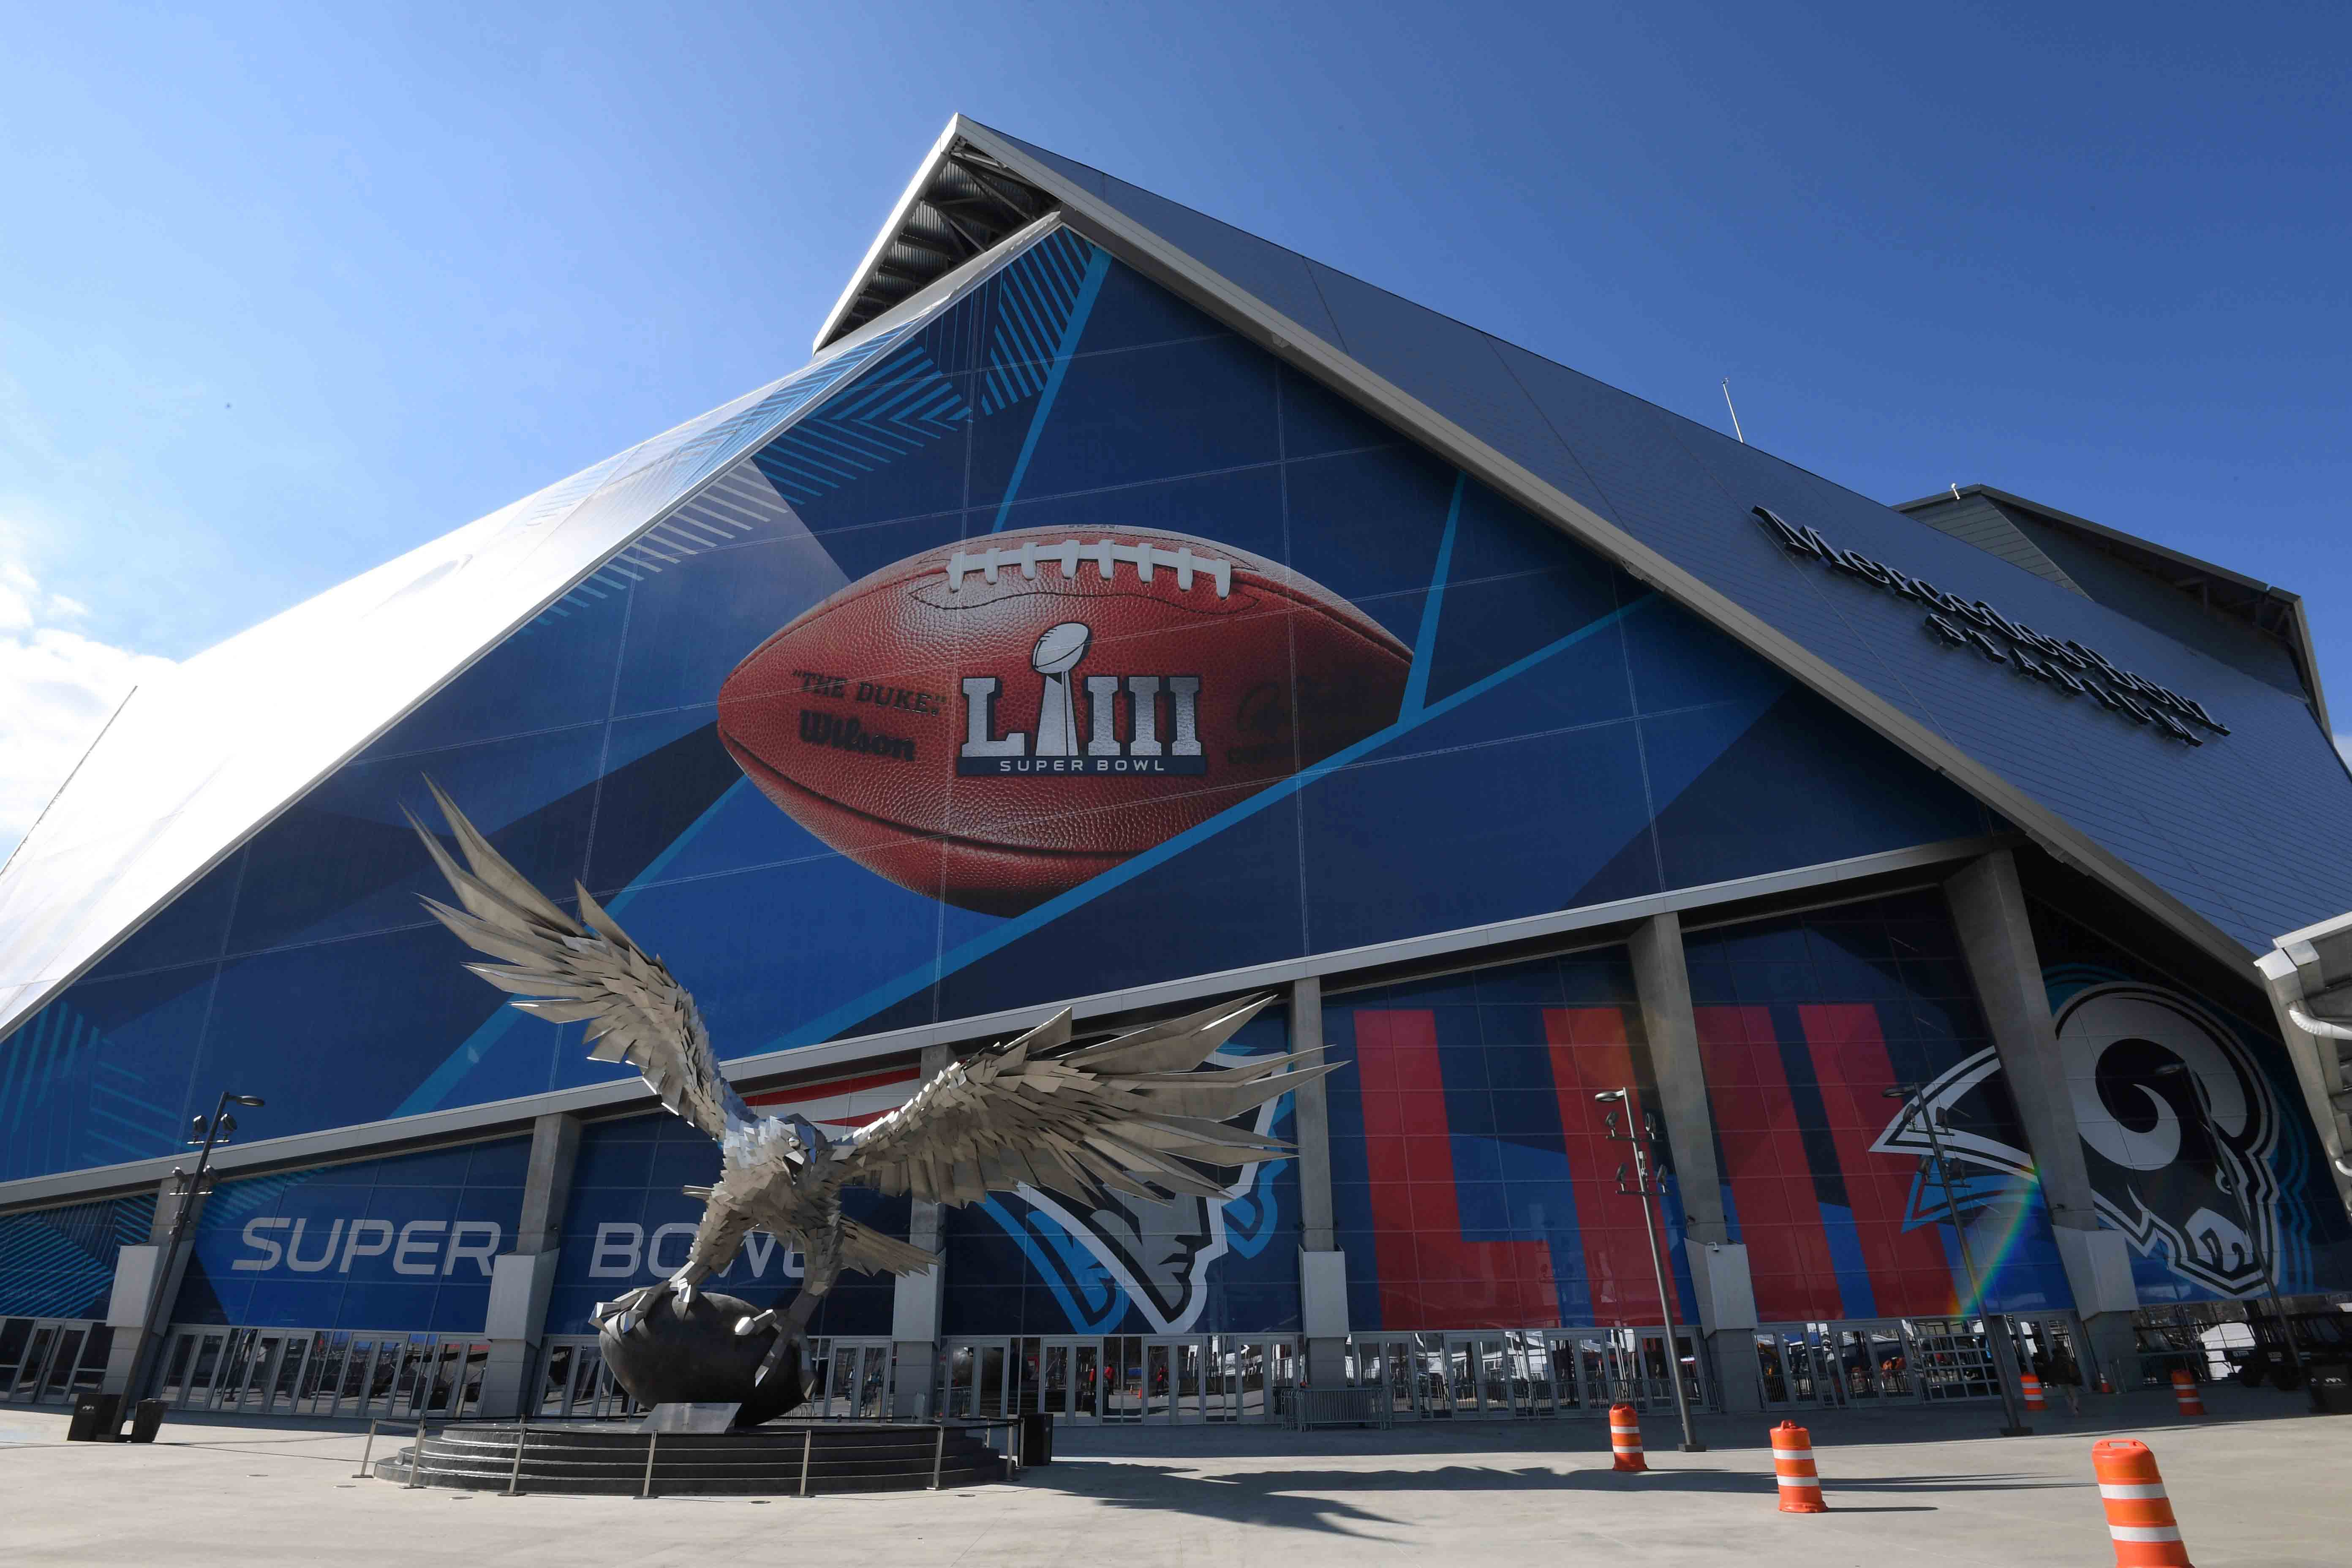 Super Bowl 2019 Venue in Atlanta